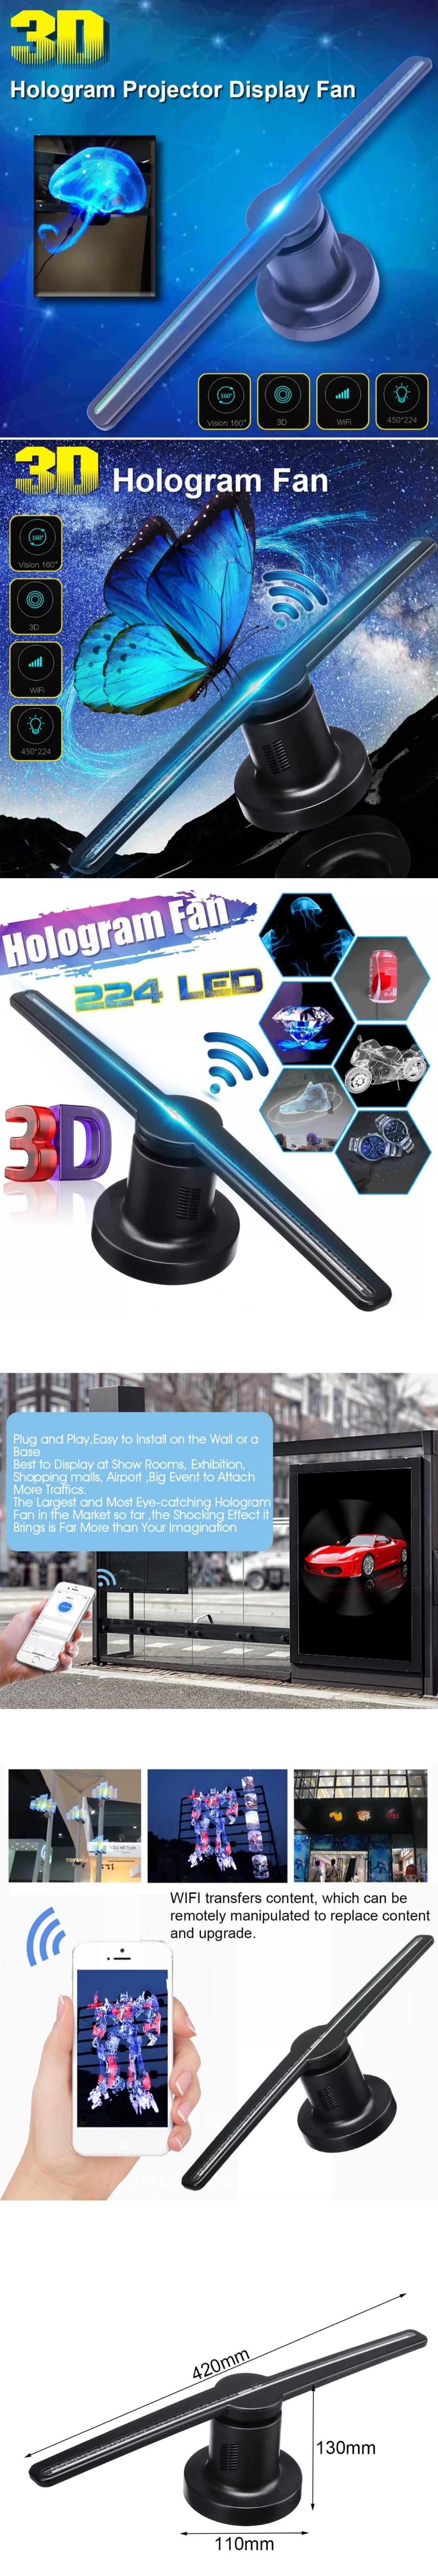 Prezentare-Proiector-LED-Holograma-3D2d9e4516632856e3.jpg